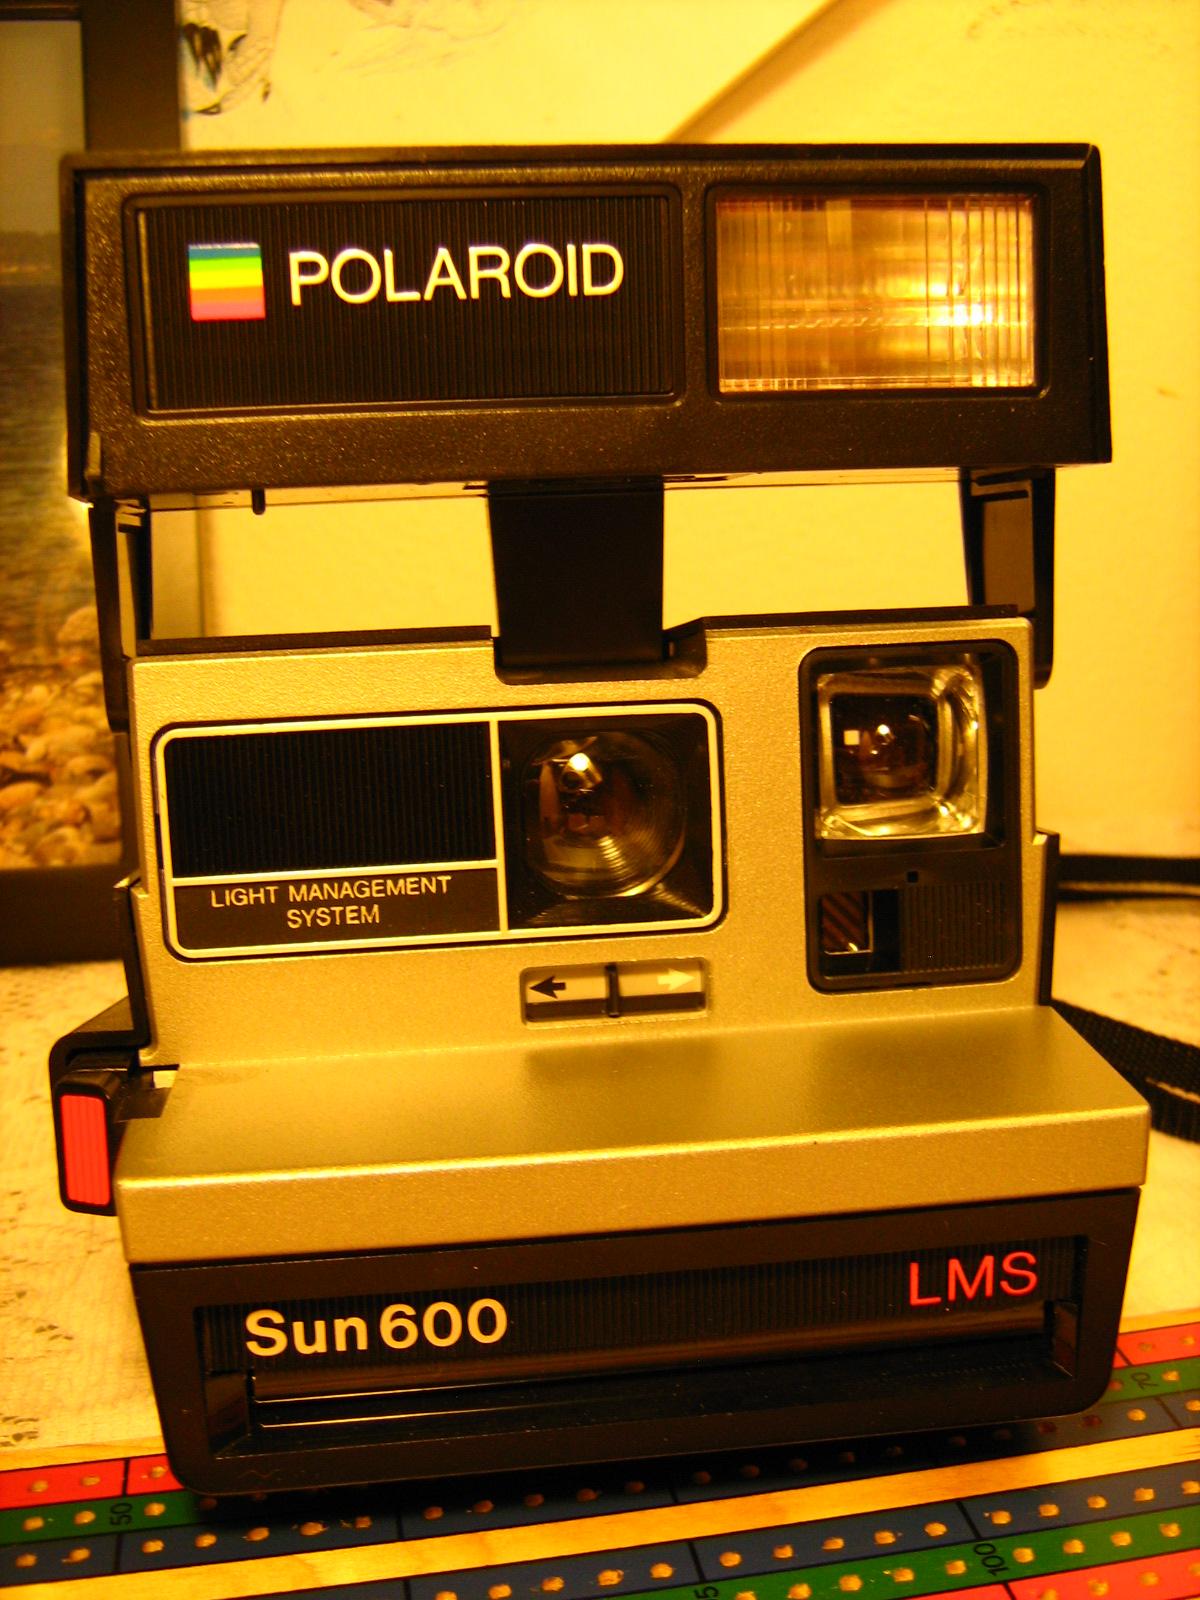 Vintage Polaroid Camera - Sun600 LMS